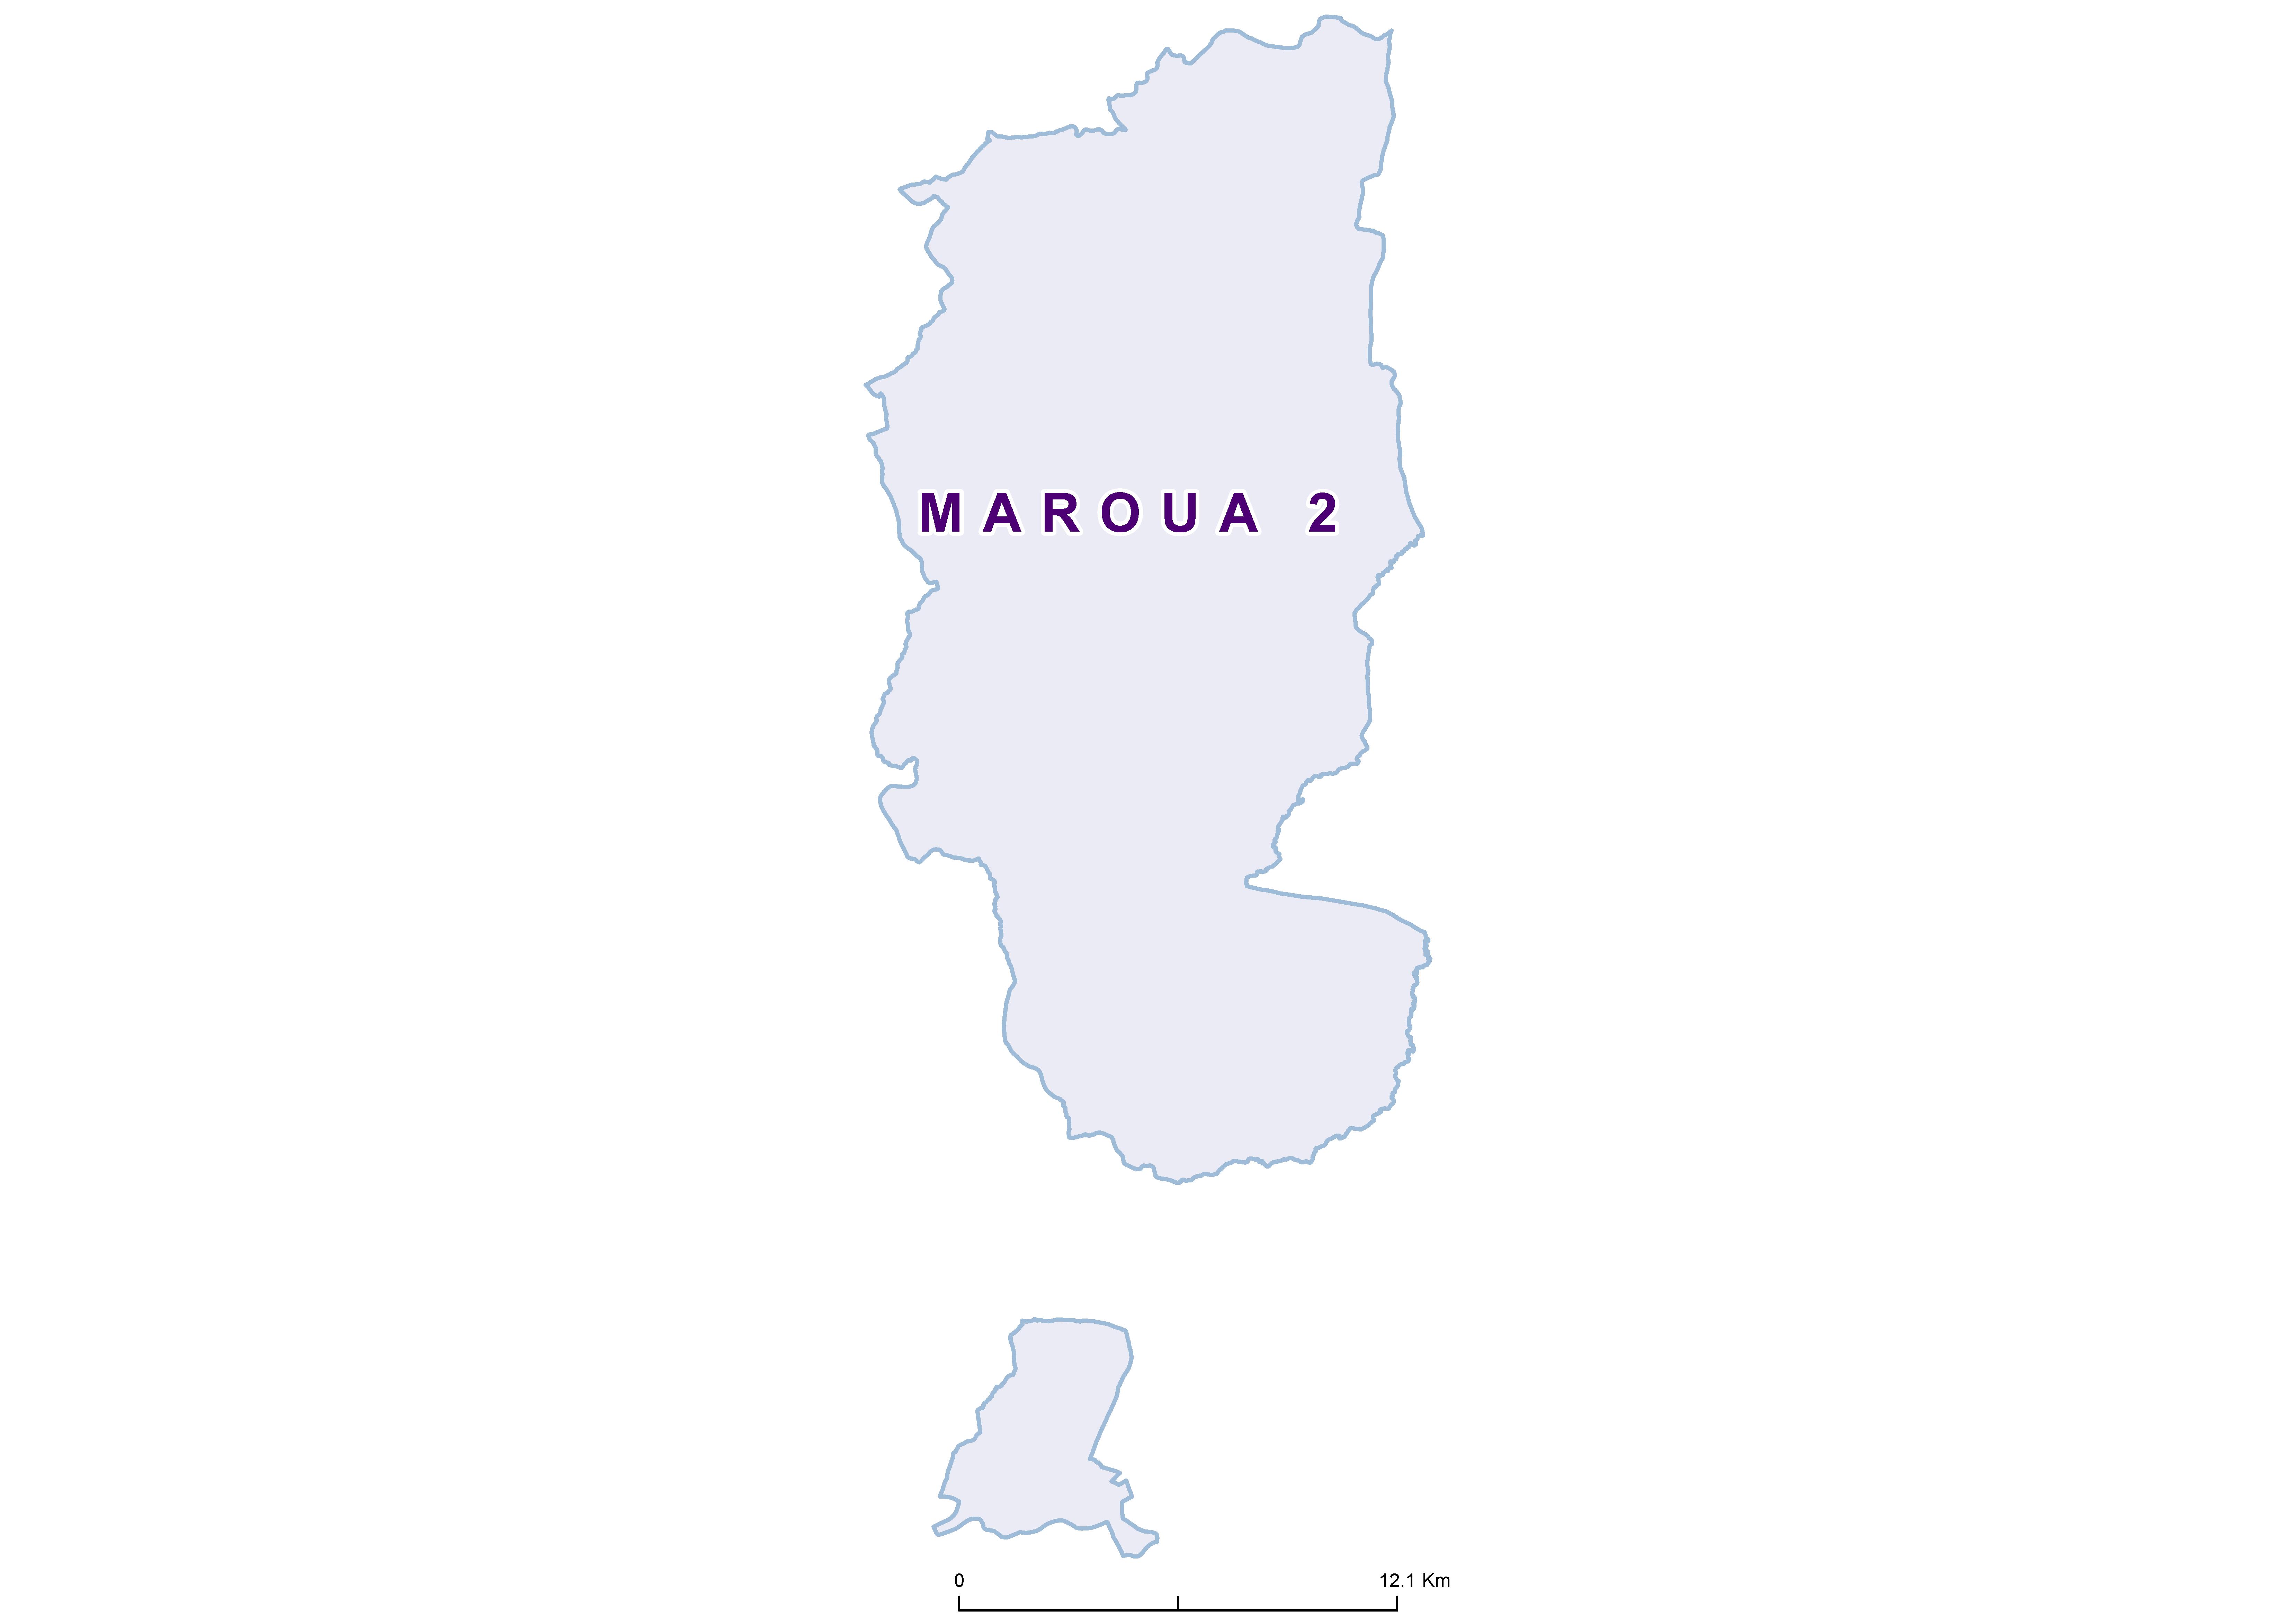 Maroua 2 Mean SCH 20180001